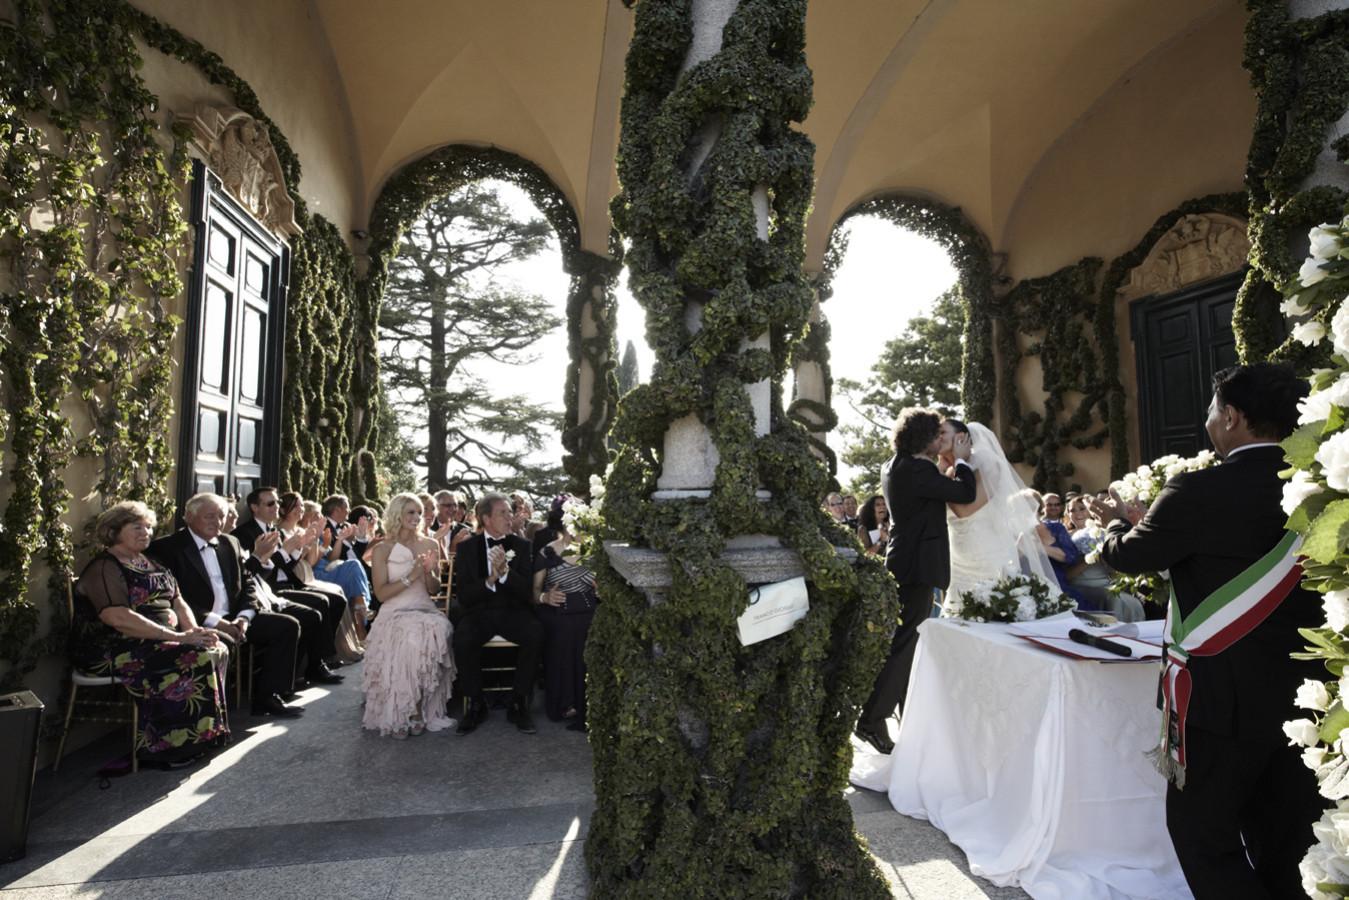 wedding-italy-outdoor-ceremony_10-1349×900